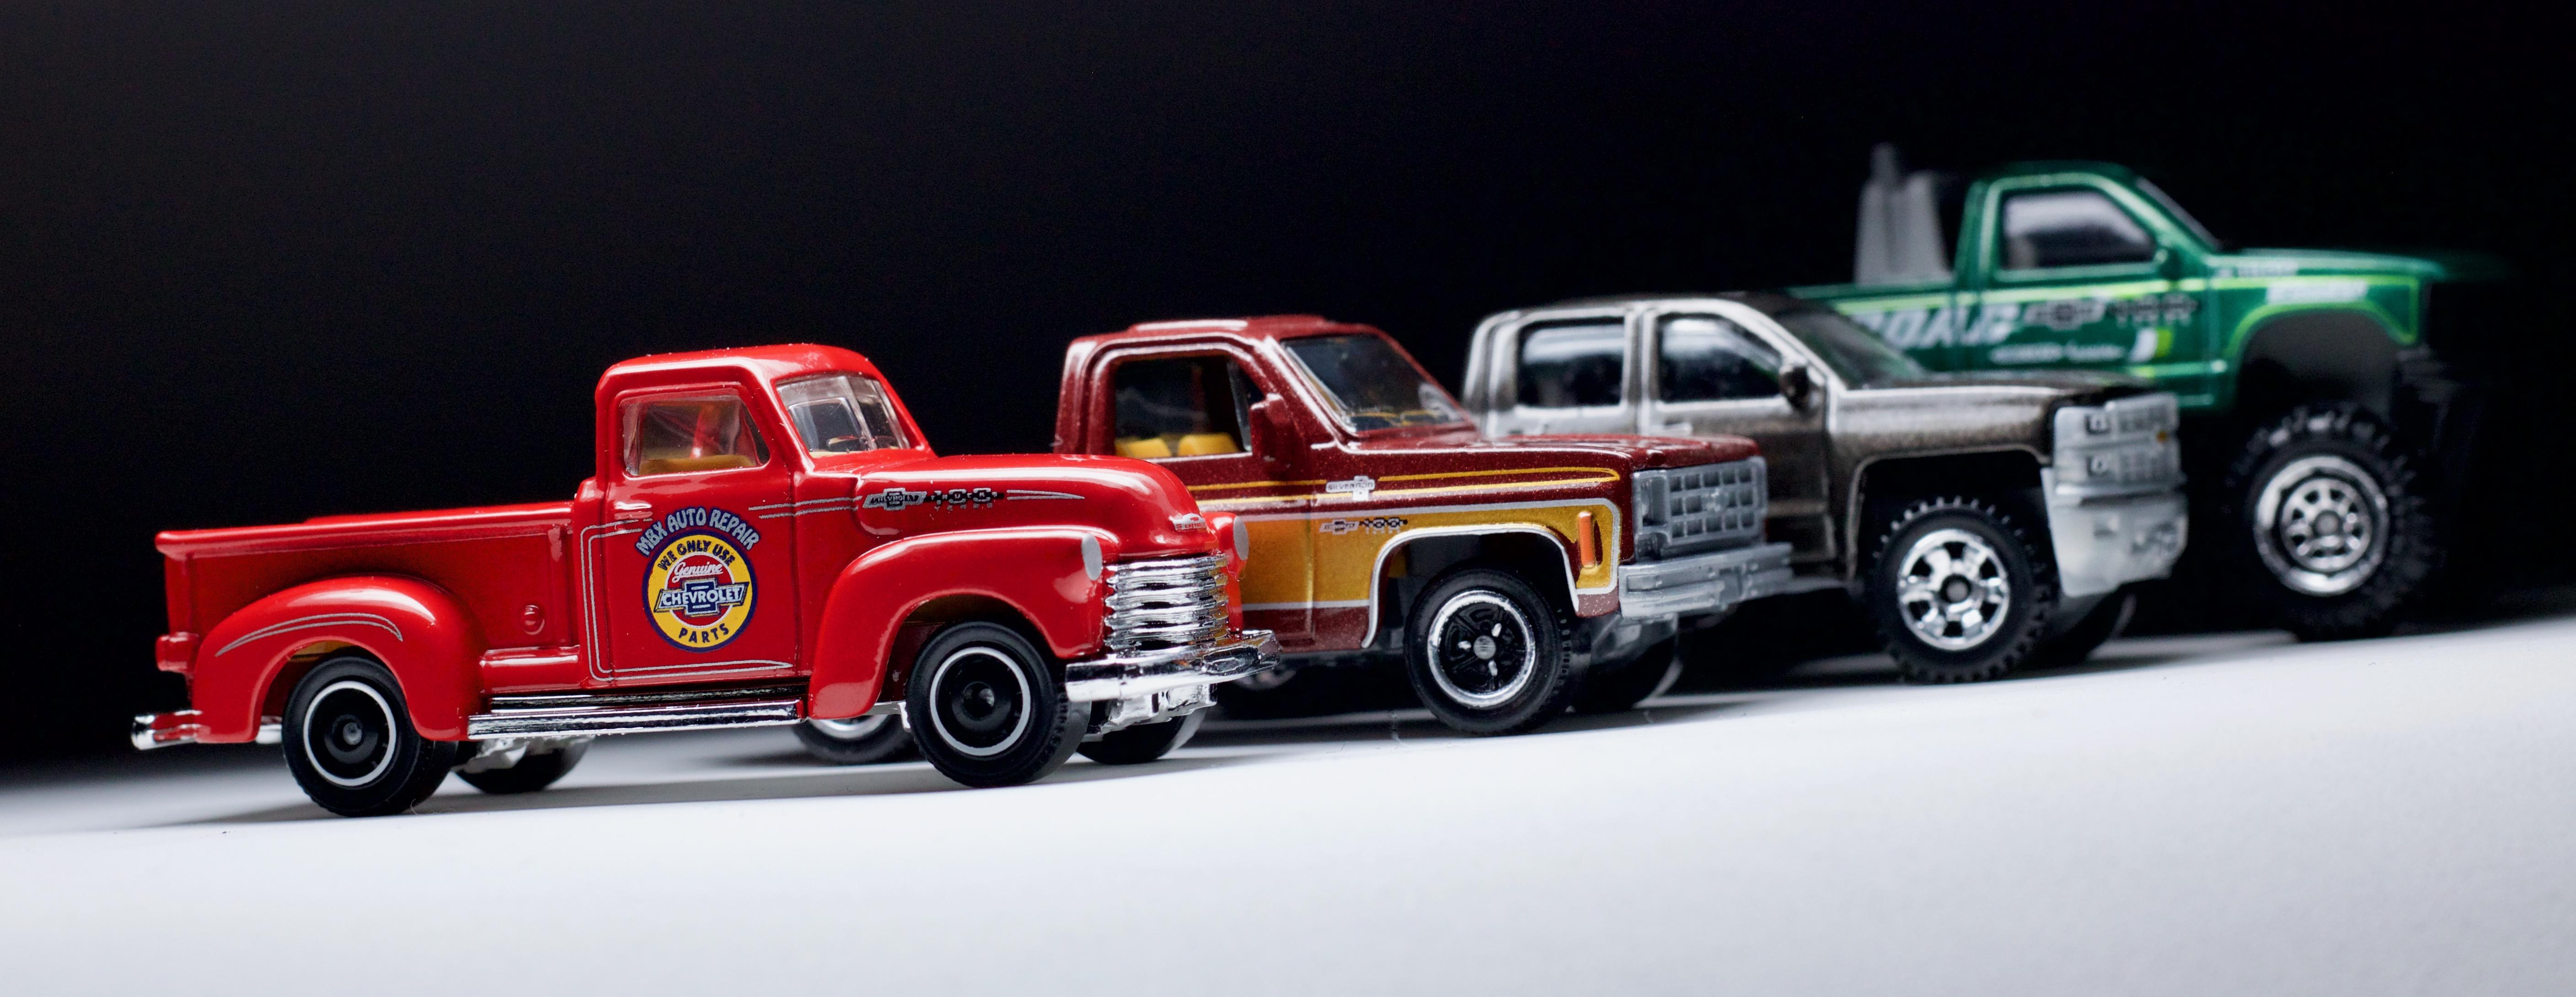 Lamley Preview: The fantastic Matchbox Chevrolet Trucks ...